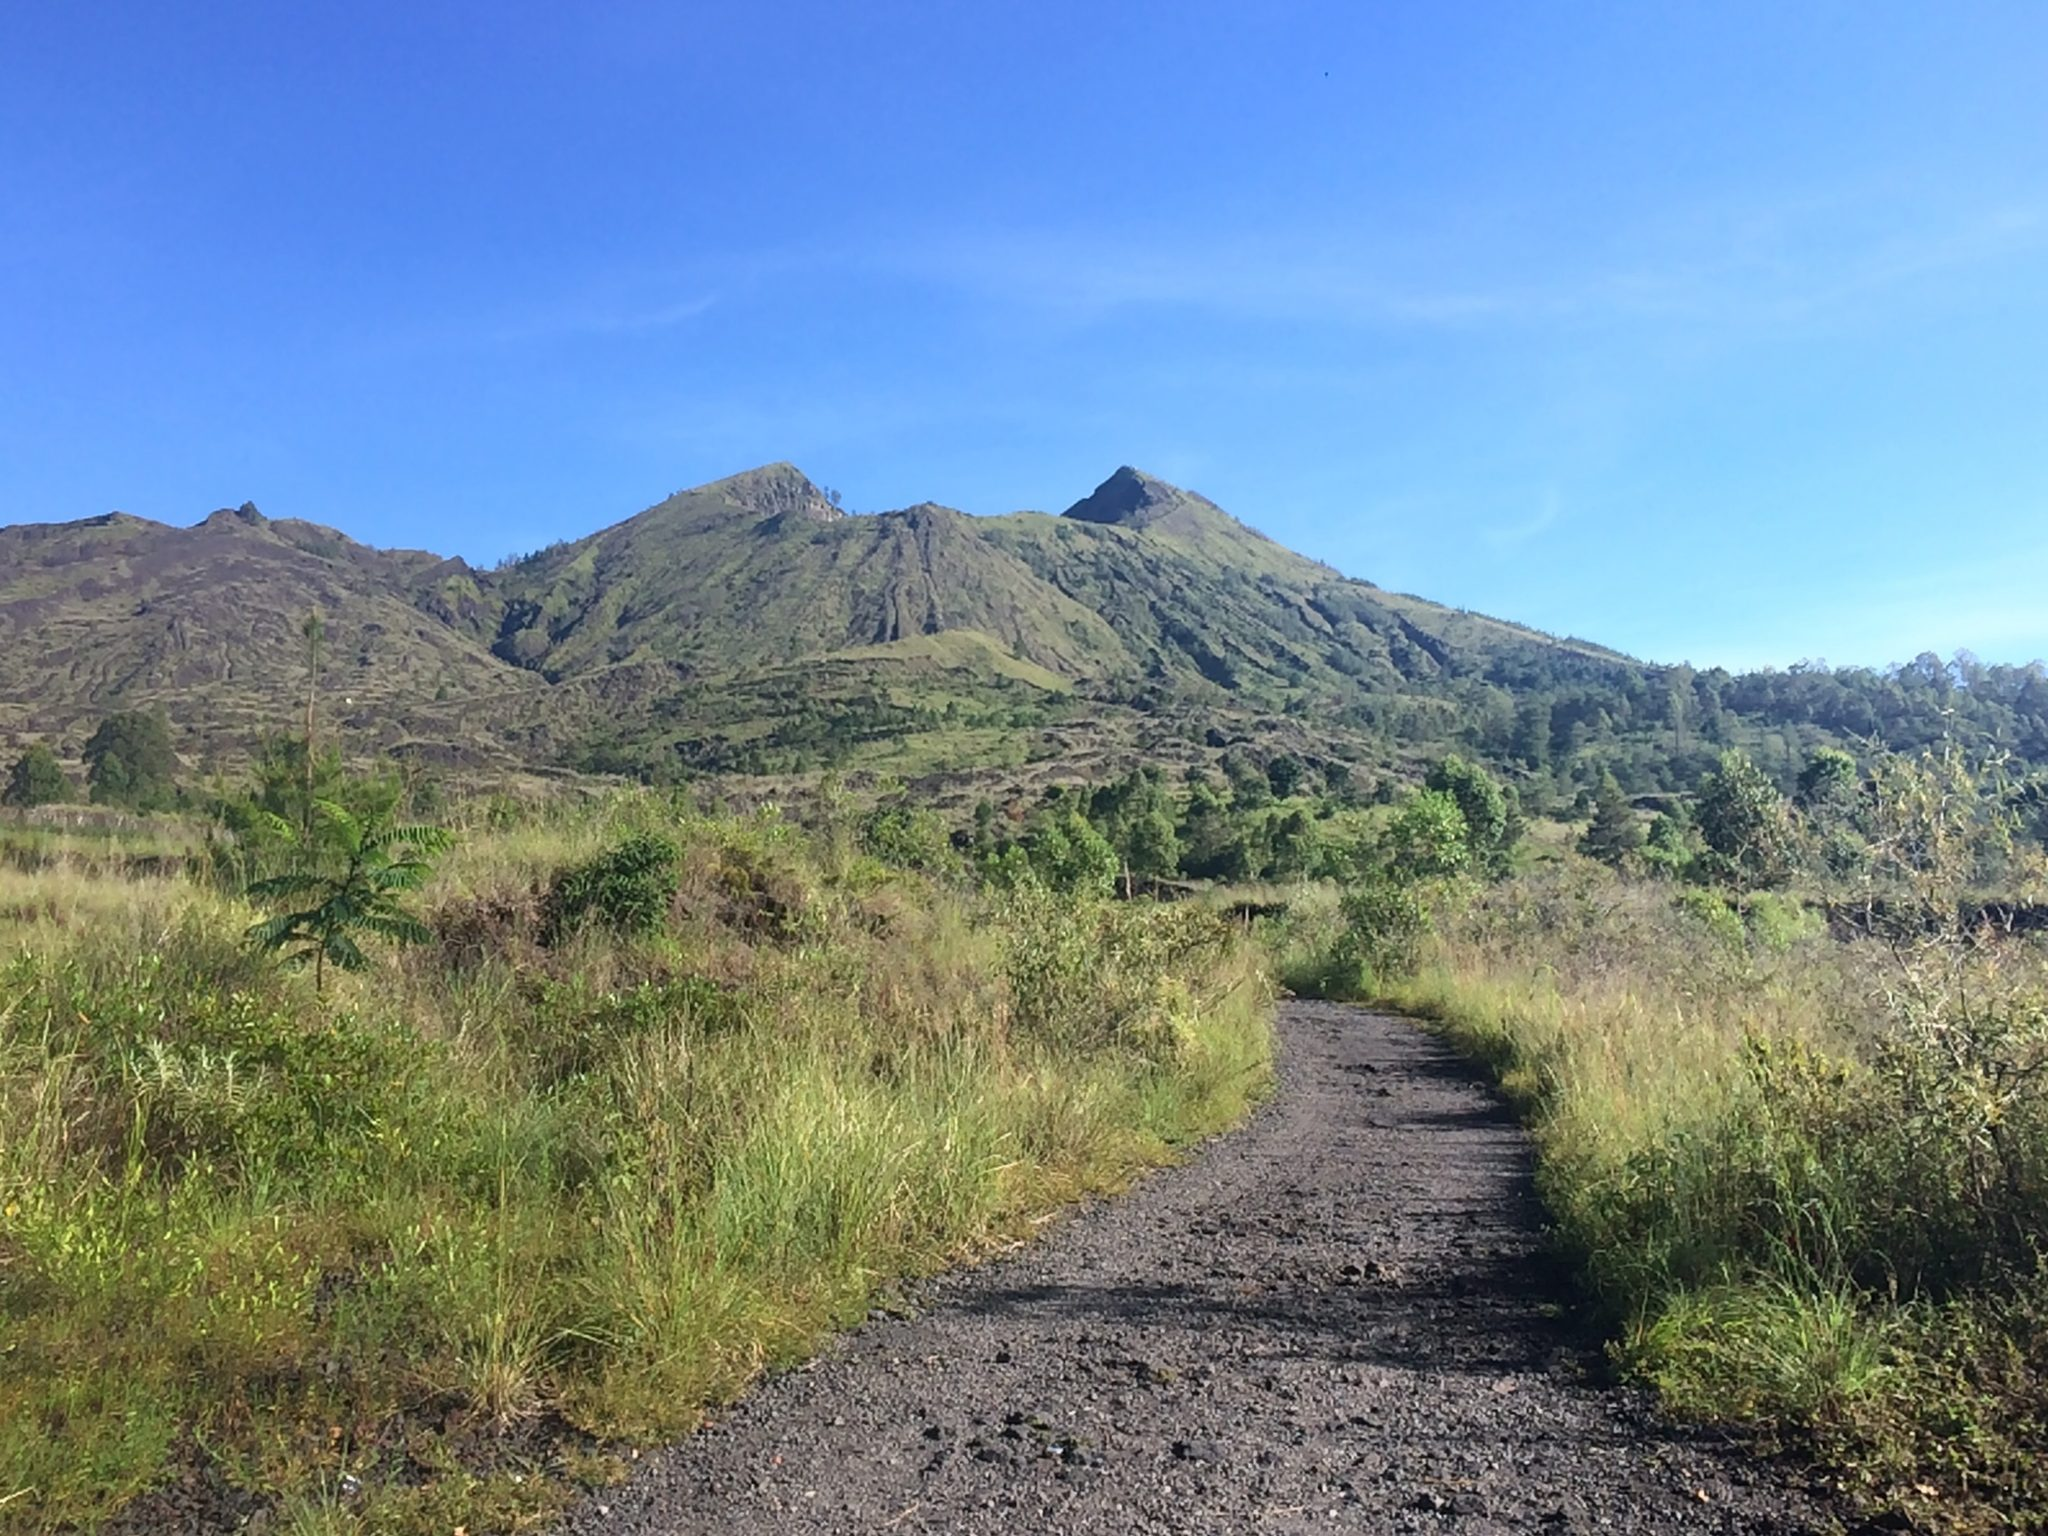 Mountain Batur road